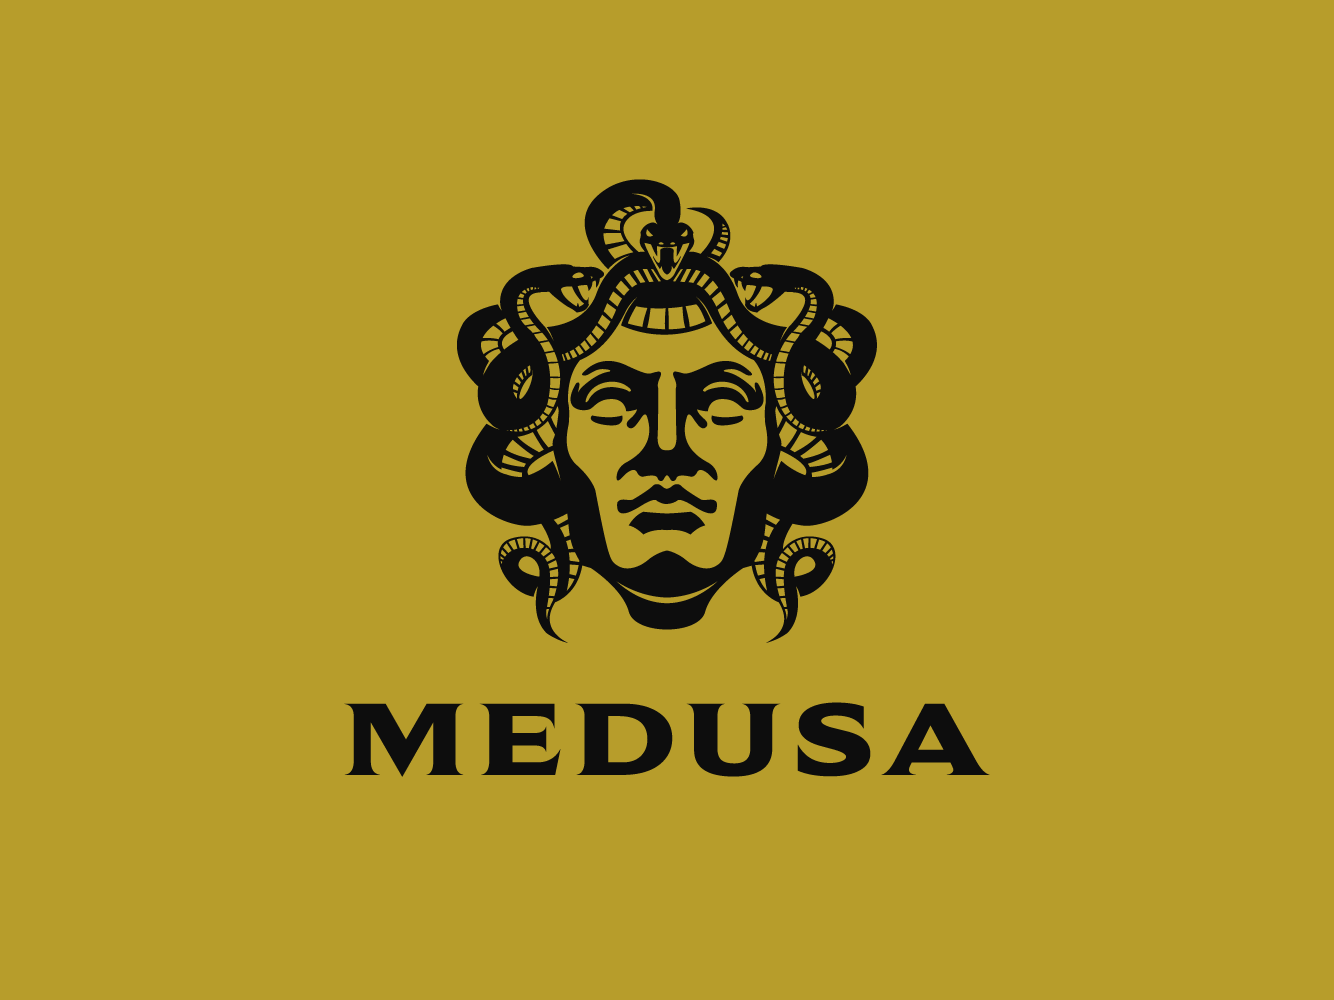 Medusa snake viper mytholigy greek mythology portait face vector logo